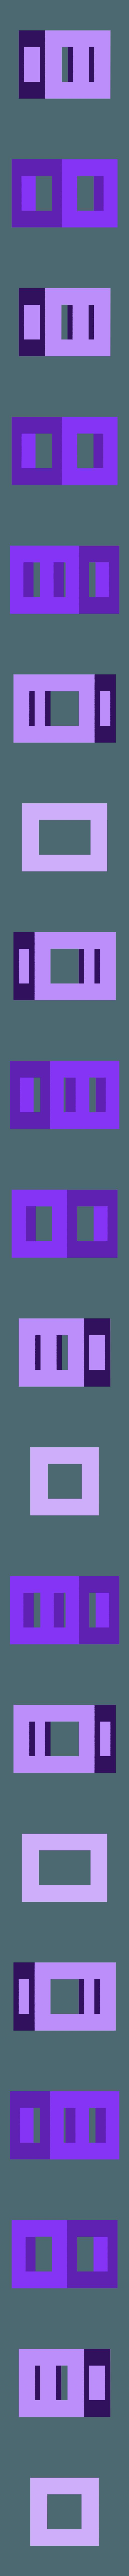 Frame.stl Download free STL file Puzzle - Triple twins • 3D print model, dancingchicken